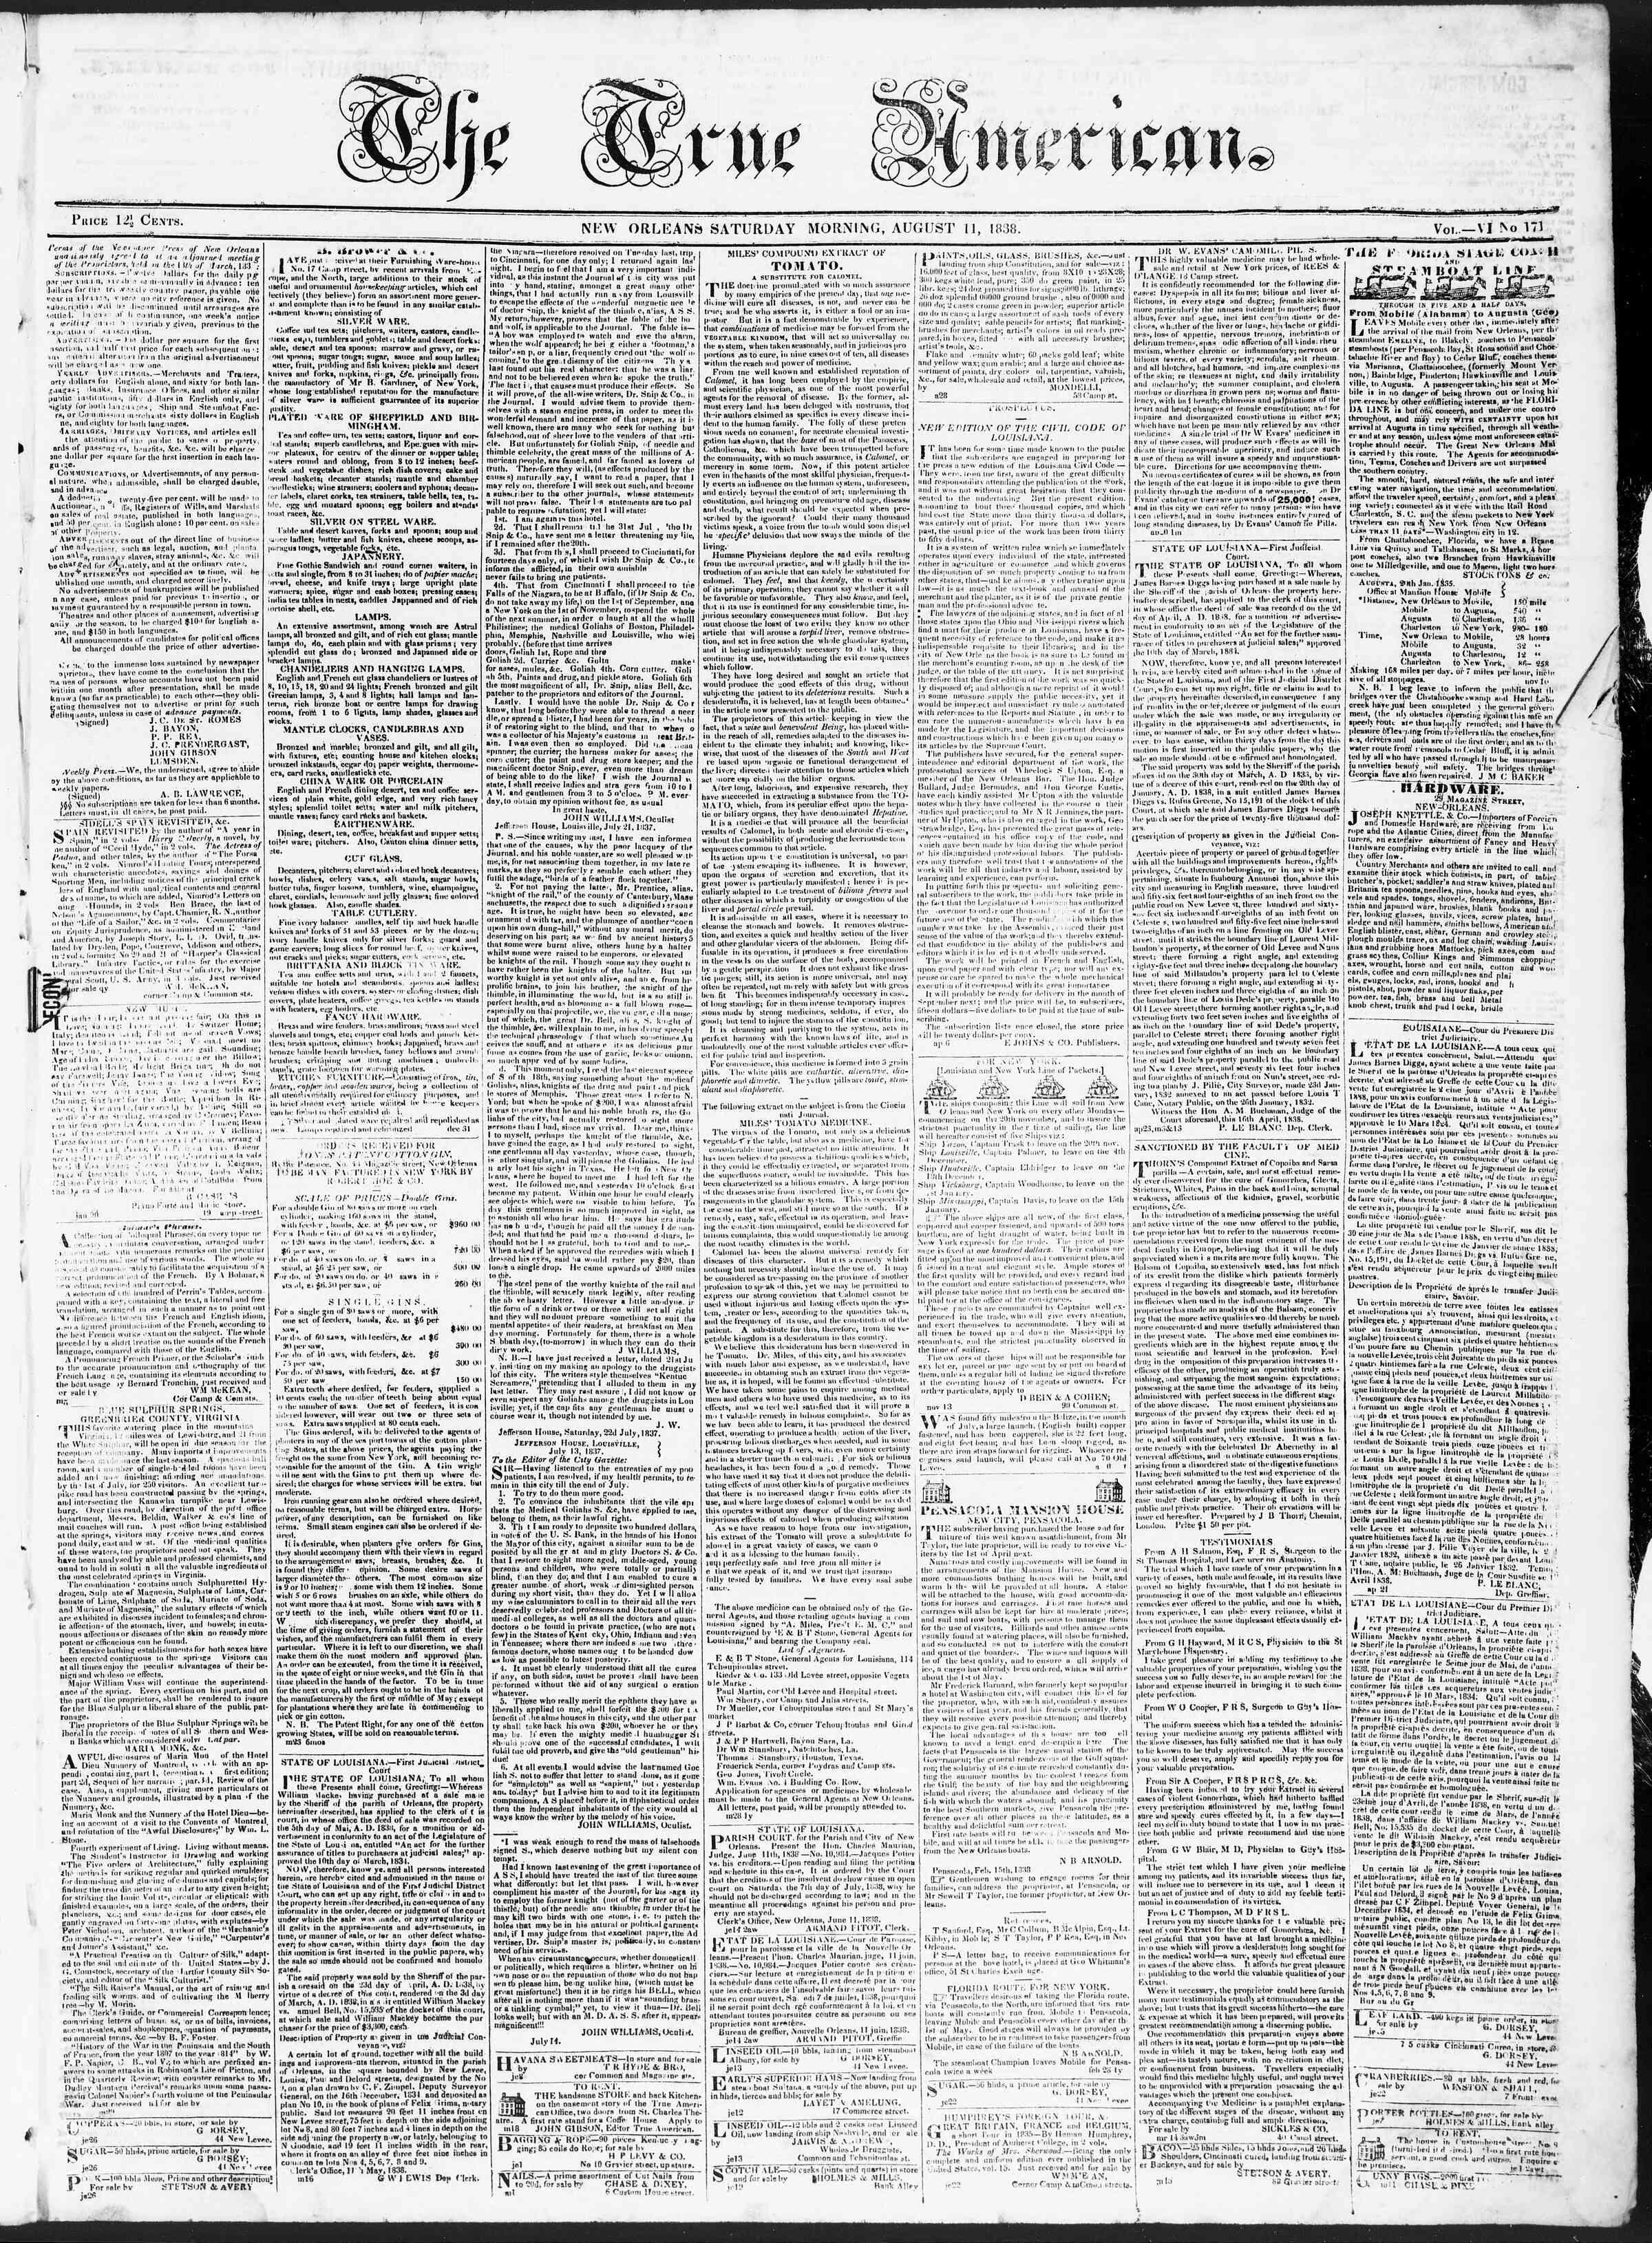 August 11, 1838 Tarihli True American Gazetesi Sayfa 1